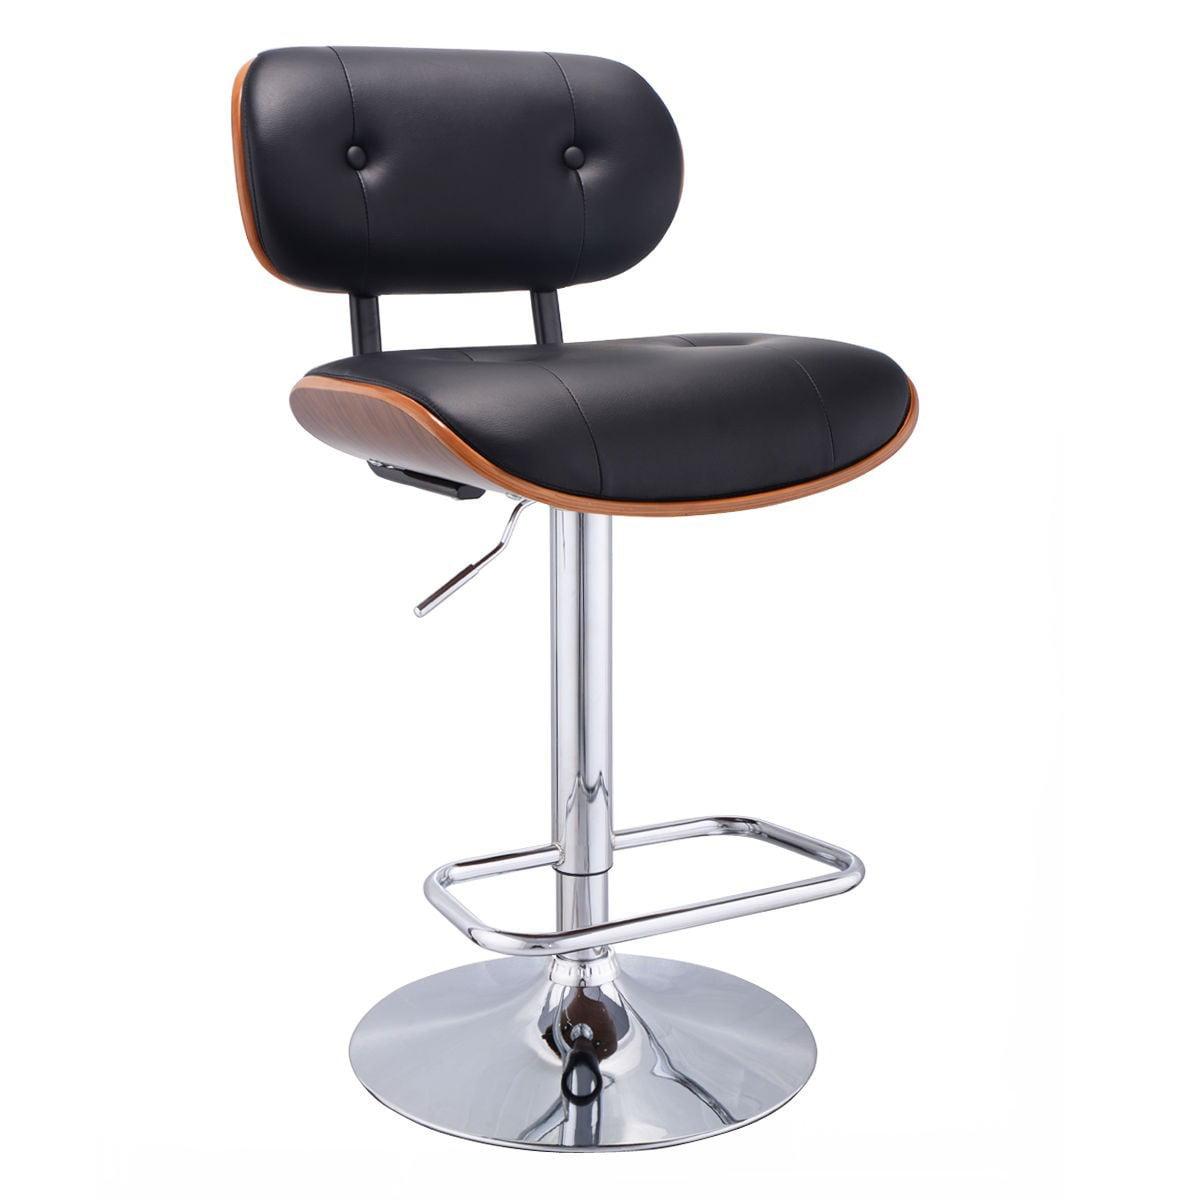 Adjustable Swivel Bentwood Bar Stool PU Leather Tufted Bar Stool Pub Chair by Apontus